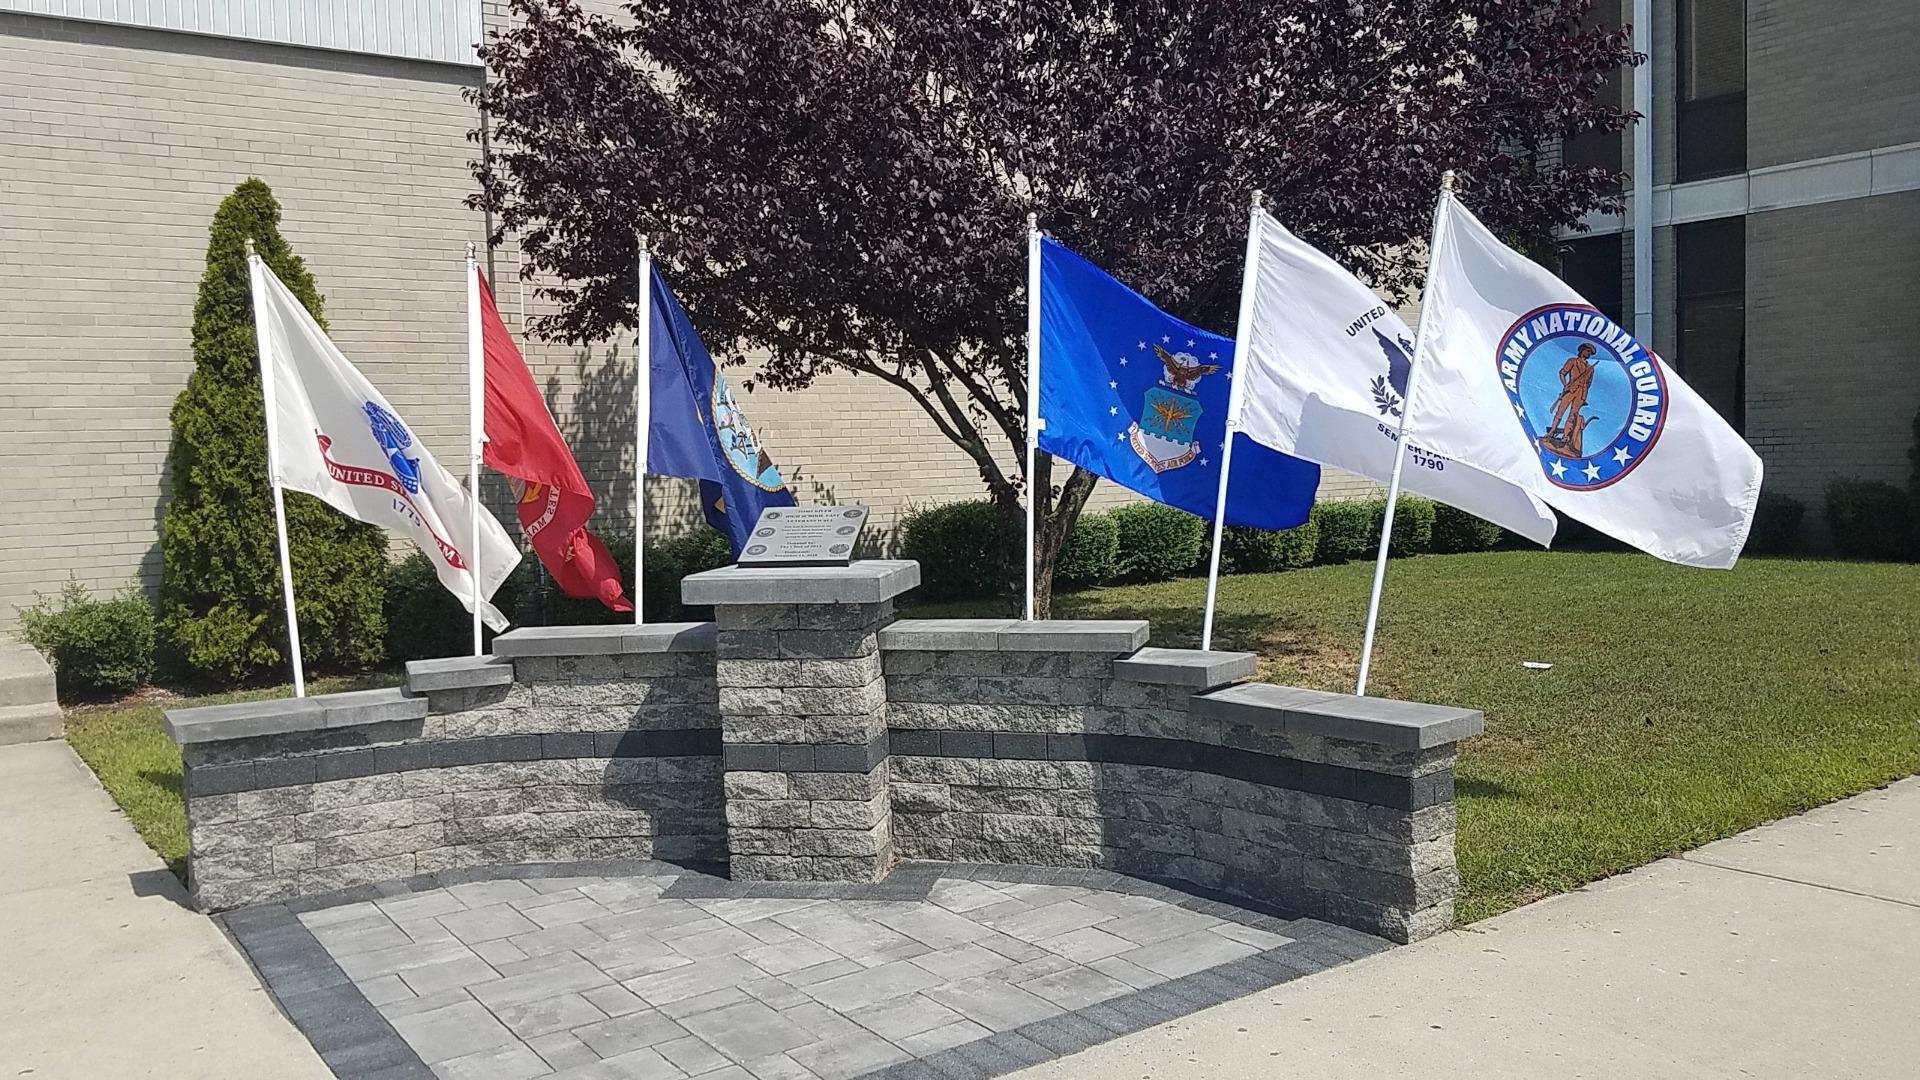 HSE flags